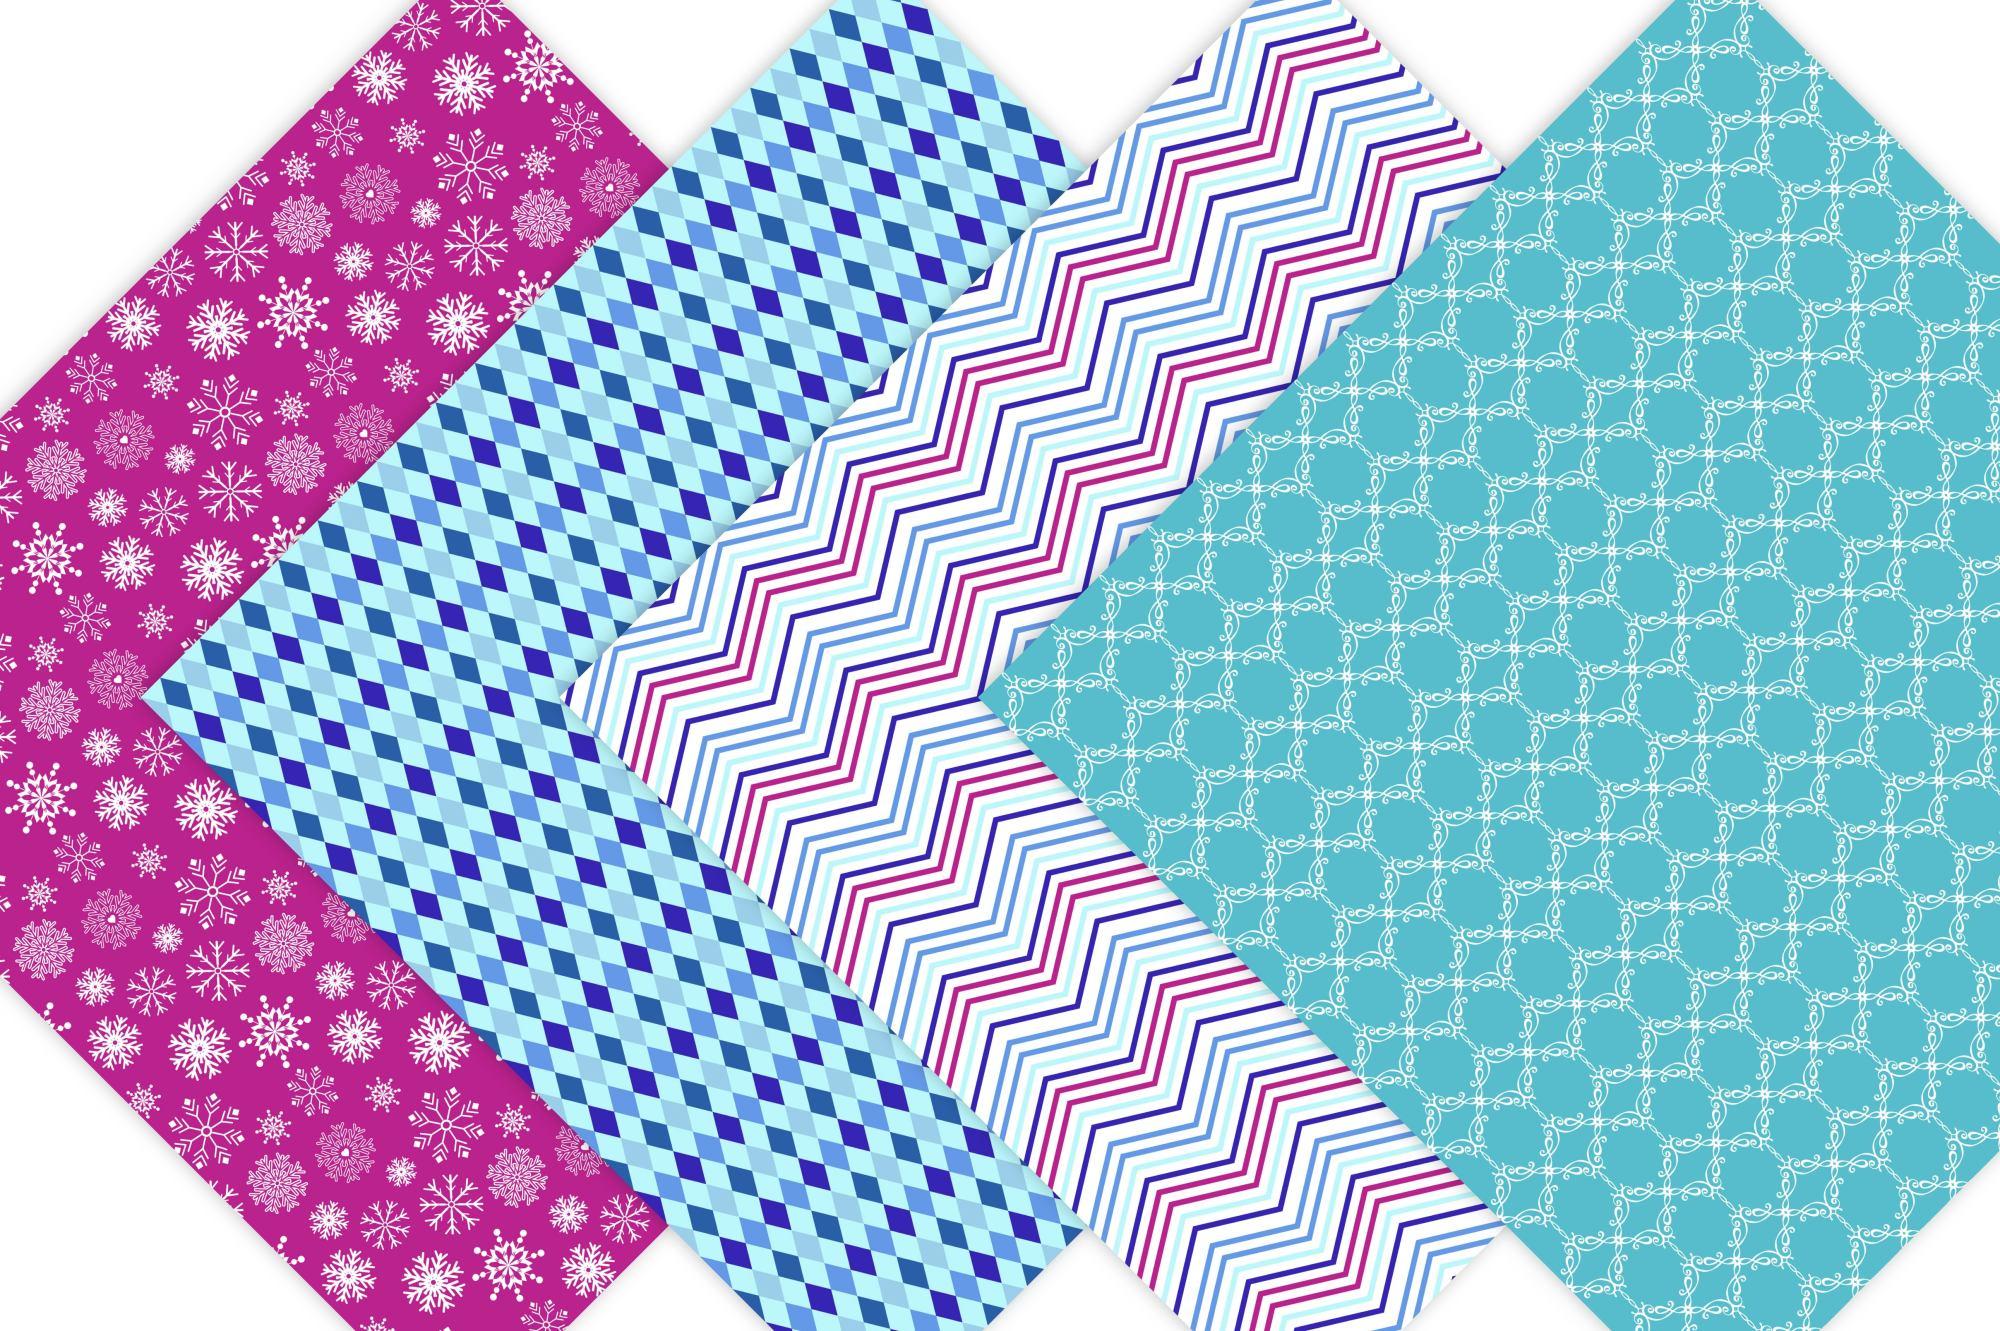 Frozen Digital Paper - Pattern Design example image 3